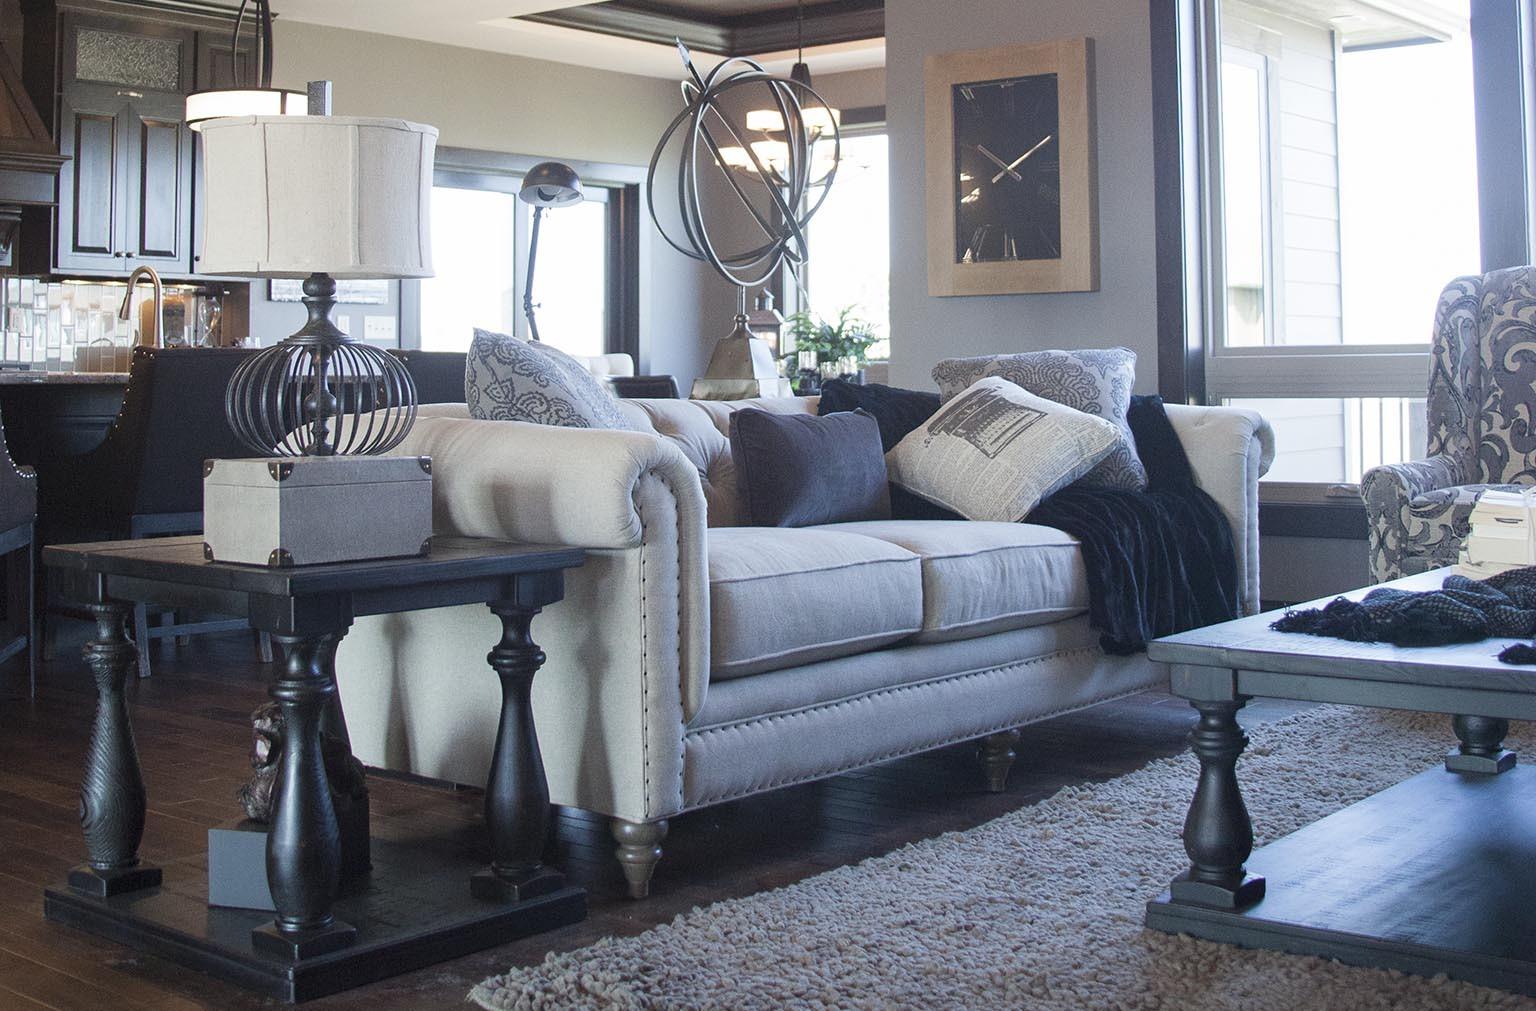 furniture mart usa | linkedin